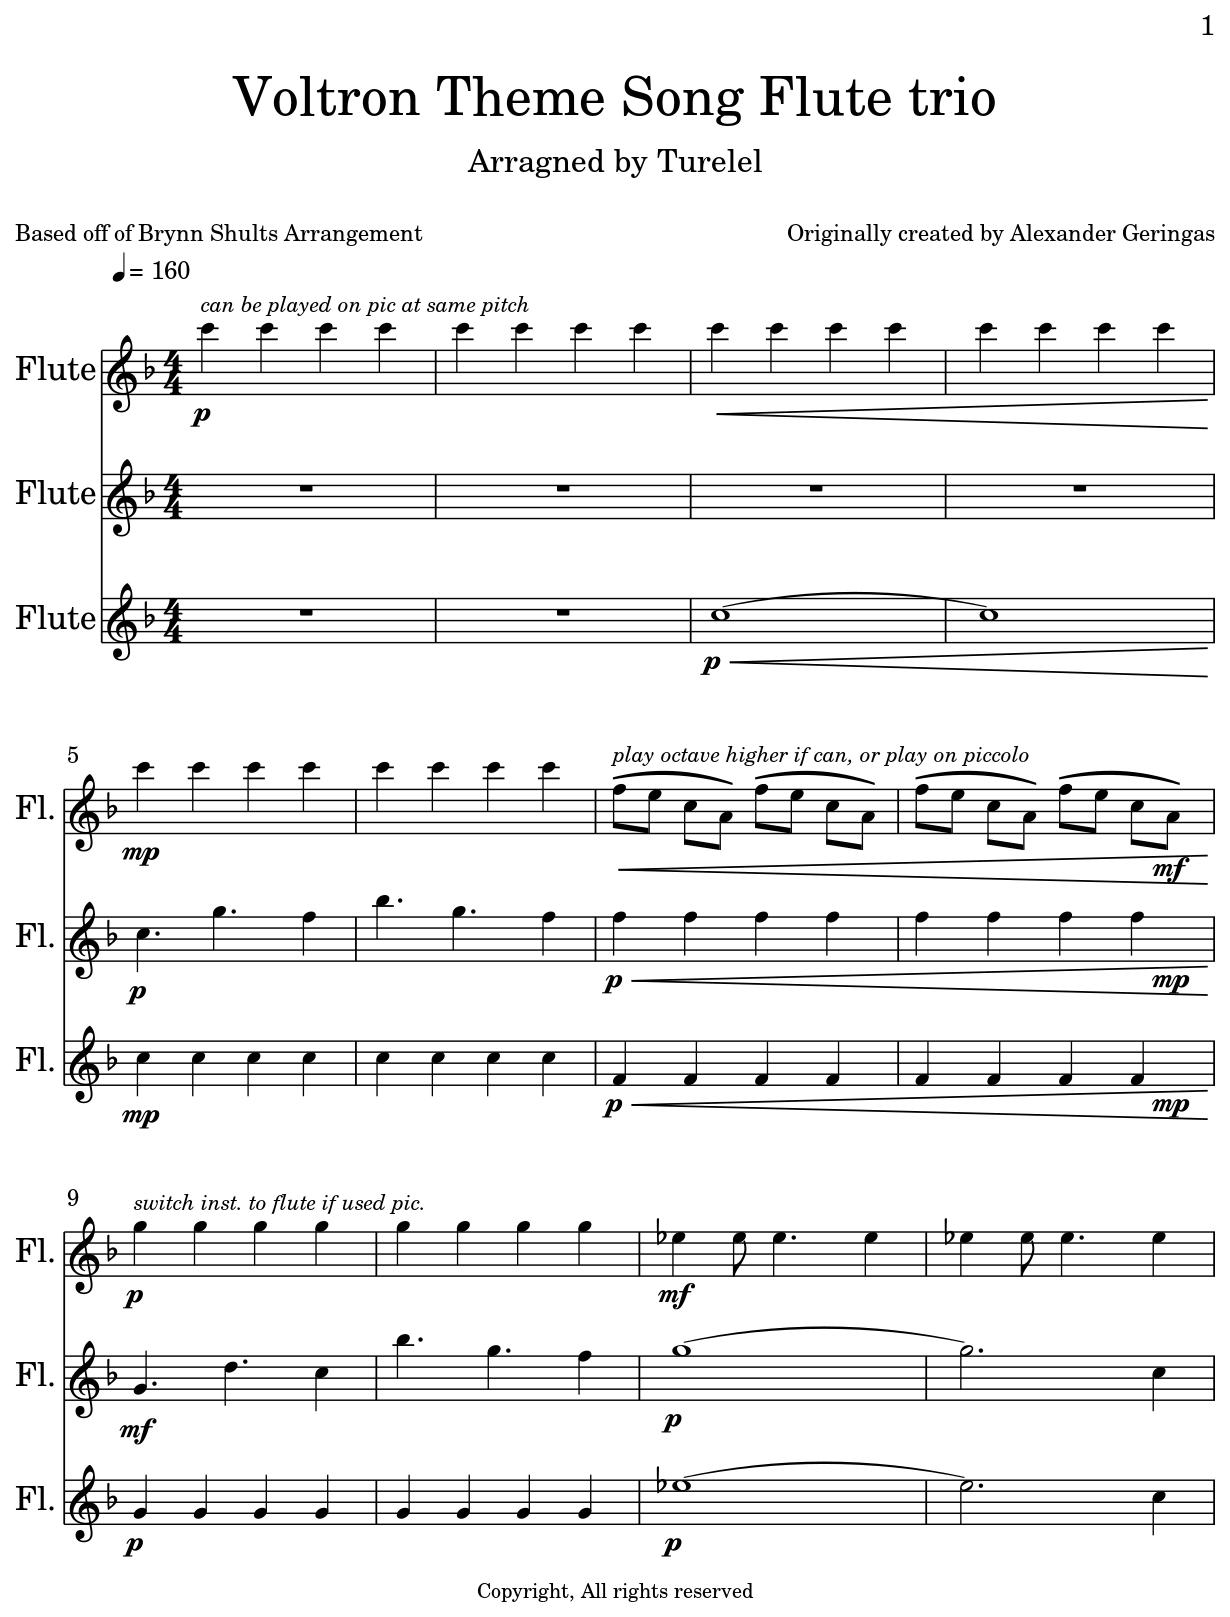 Image Result For Music Instruments Flute